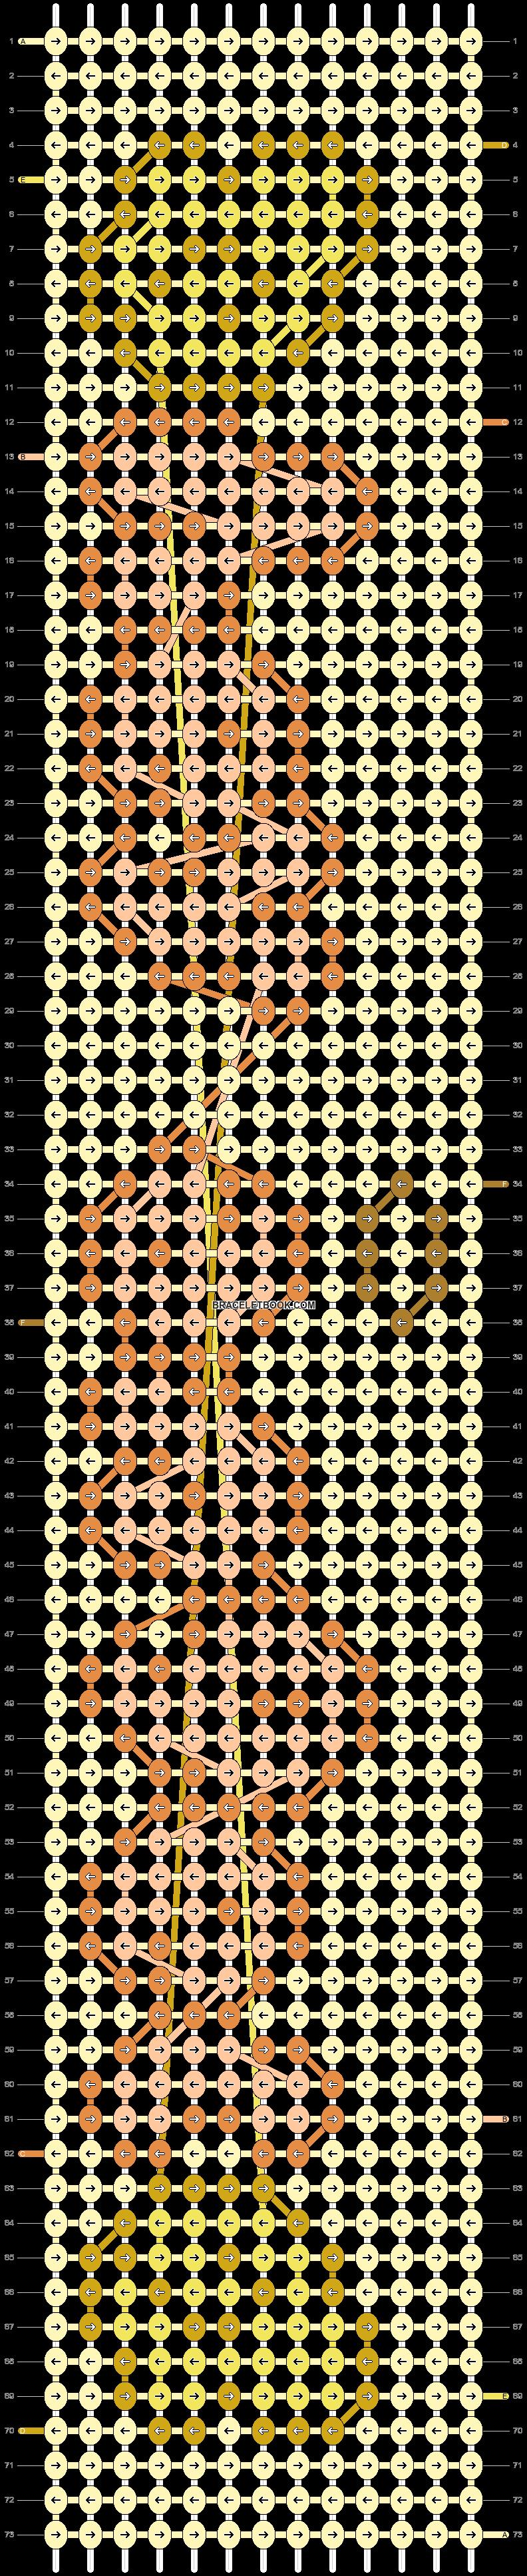 Alpha pattern #83707 variation #151835 pattern